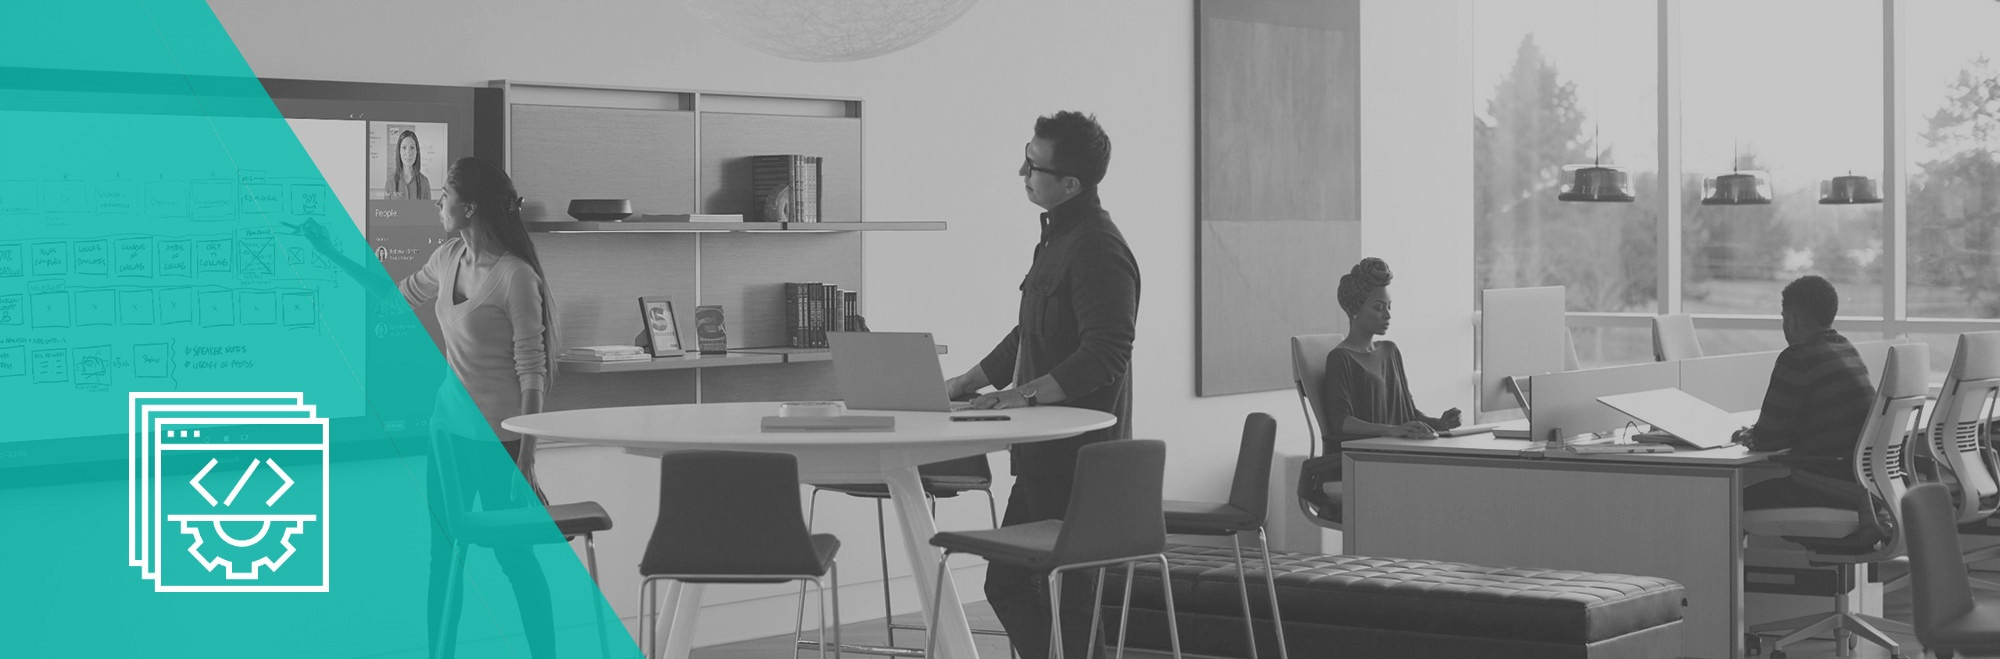 Microsoft Dynamics 365: Vendor Consignment Solutions